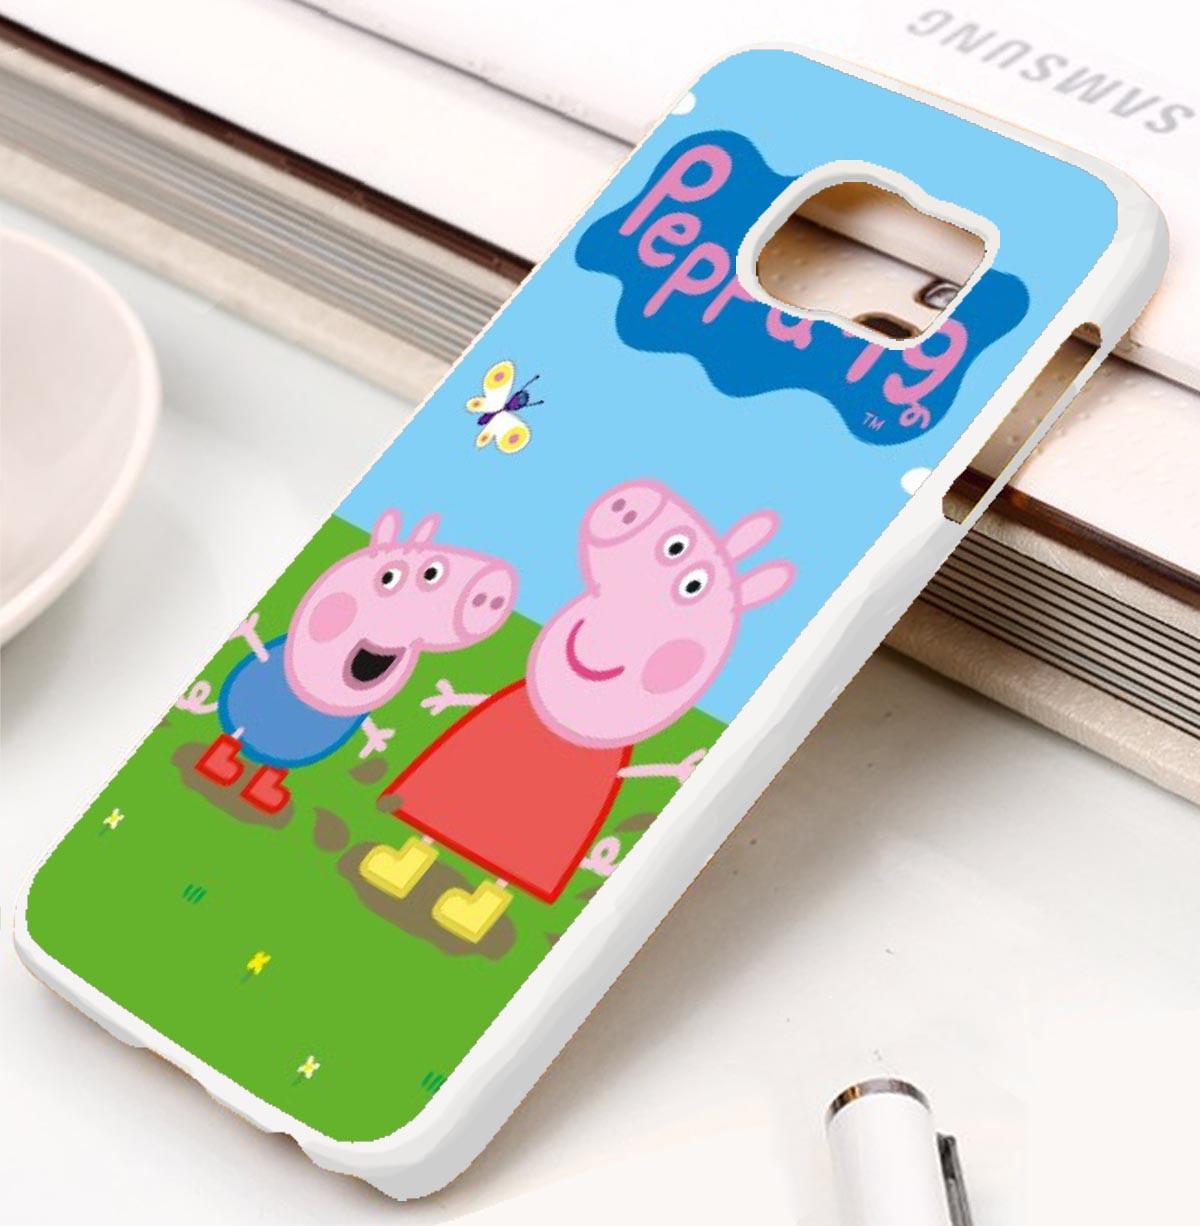 Peppa Pig Samsung Galaxy S3 S4 S5 S6 S7 Case Cases